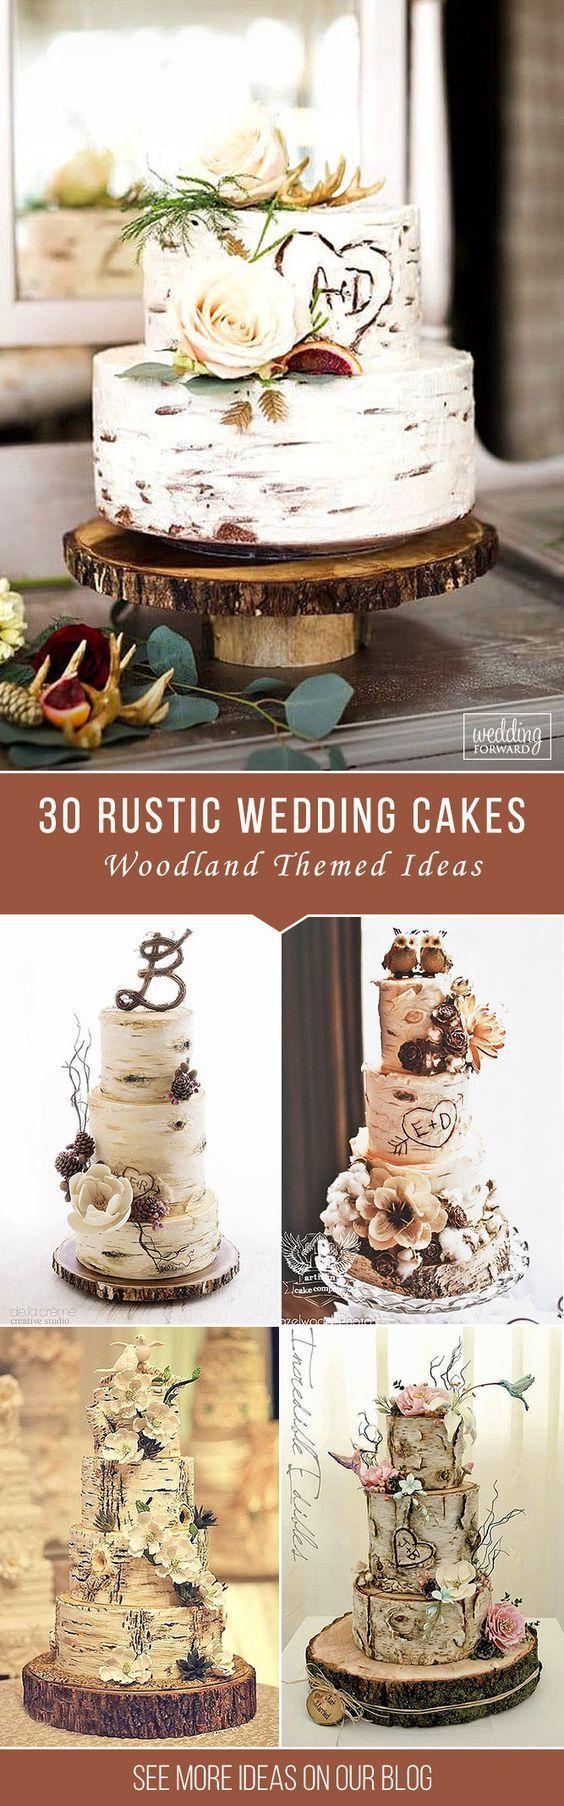 mustsee rustic woodland themed wedding cakes woodland themed